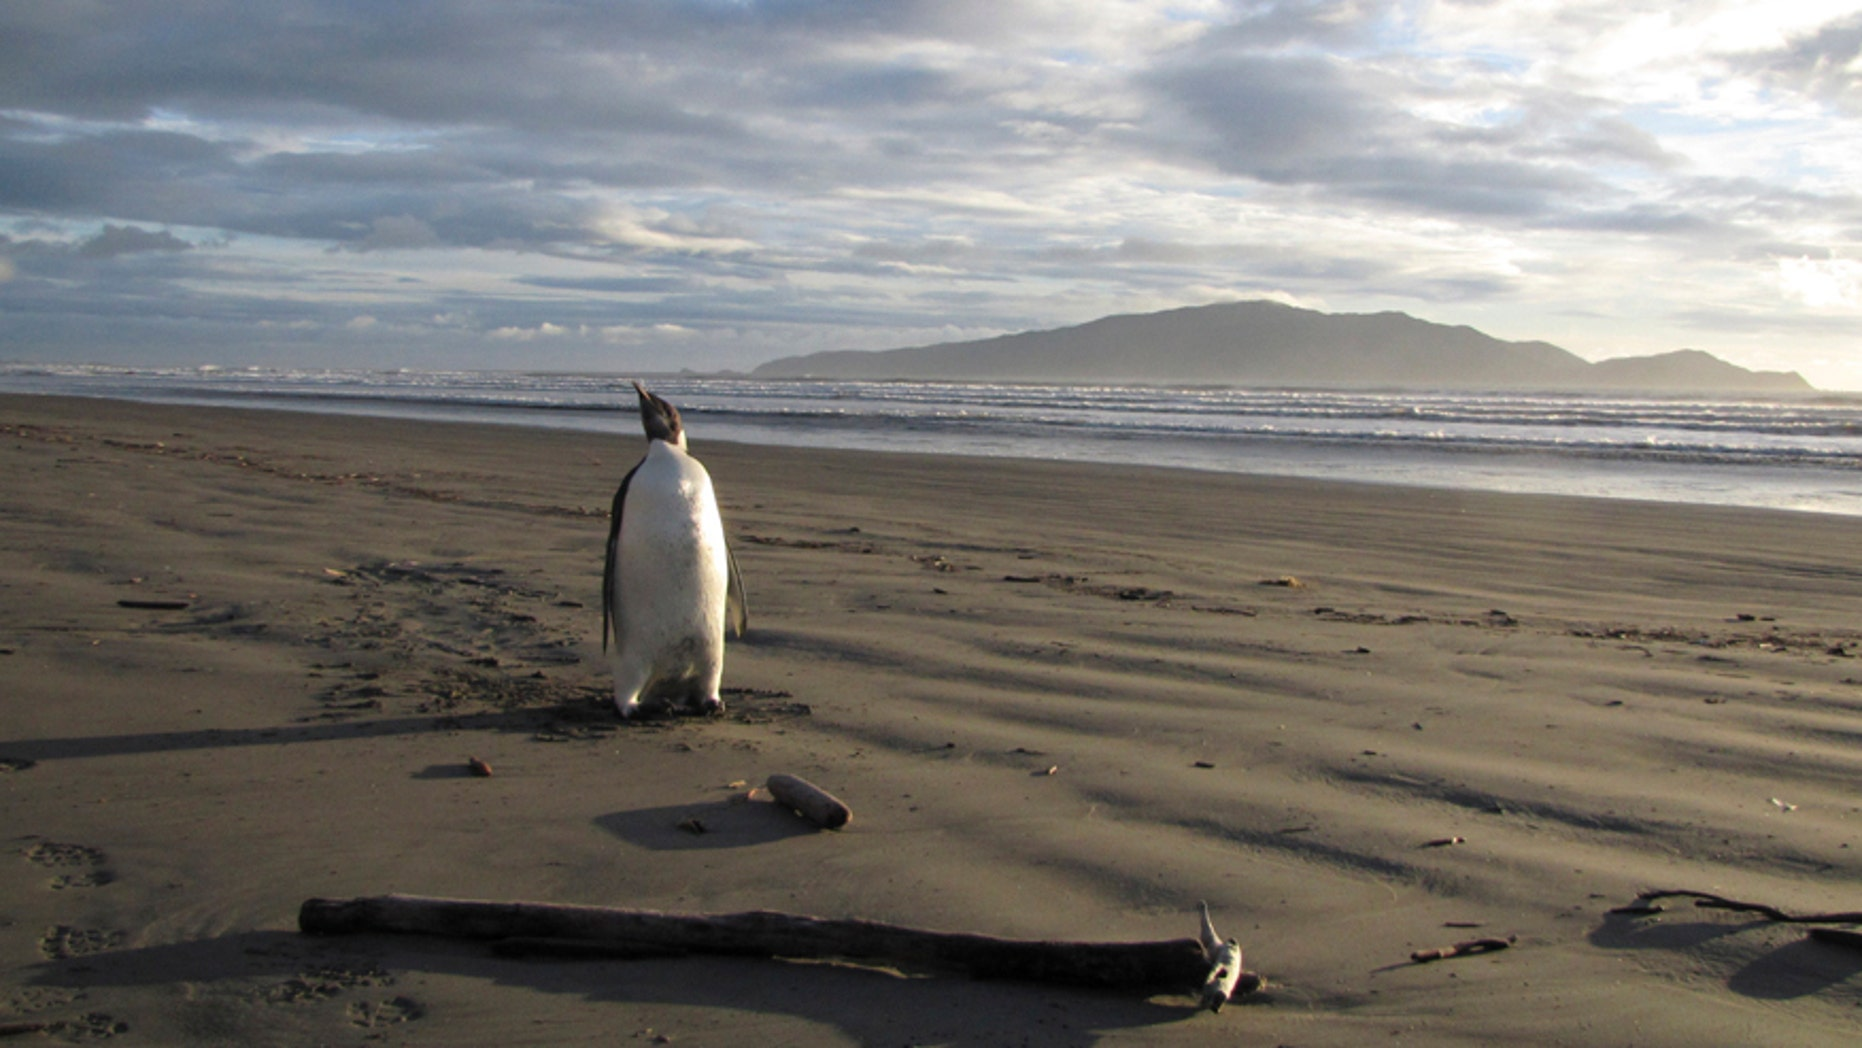 An Emperor Penguin stands on a beach on Kapiti coast June 20, 2011.